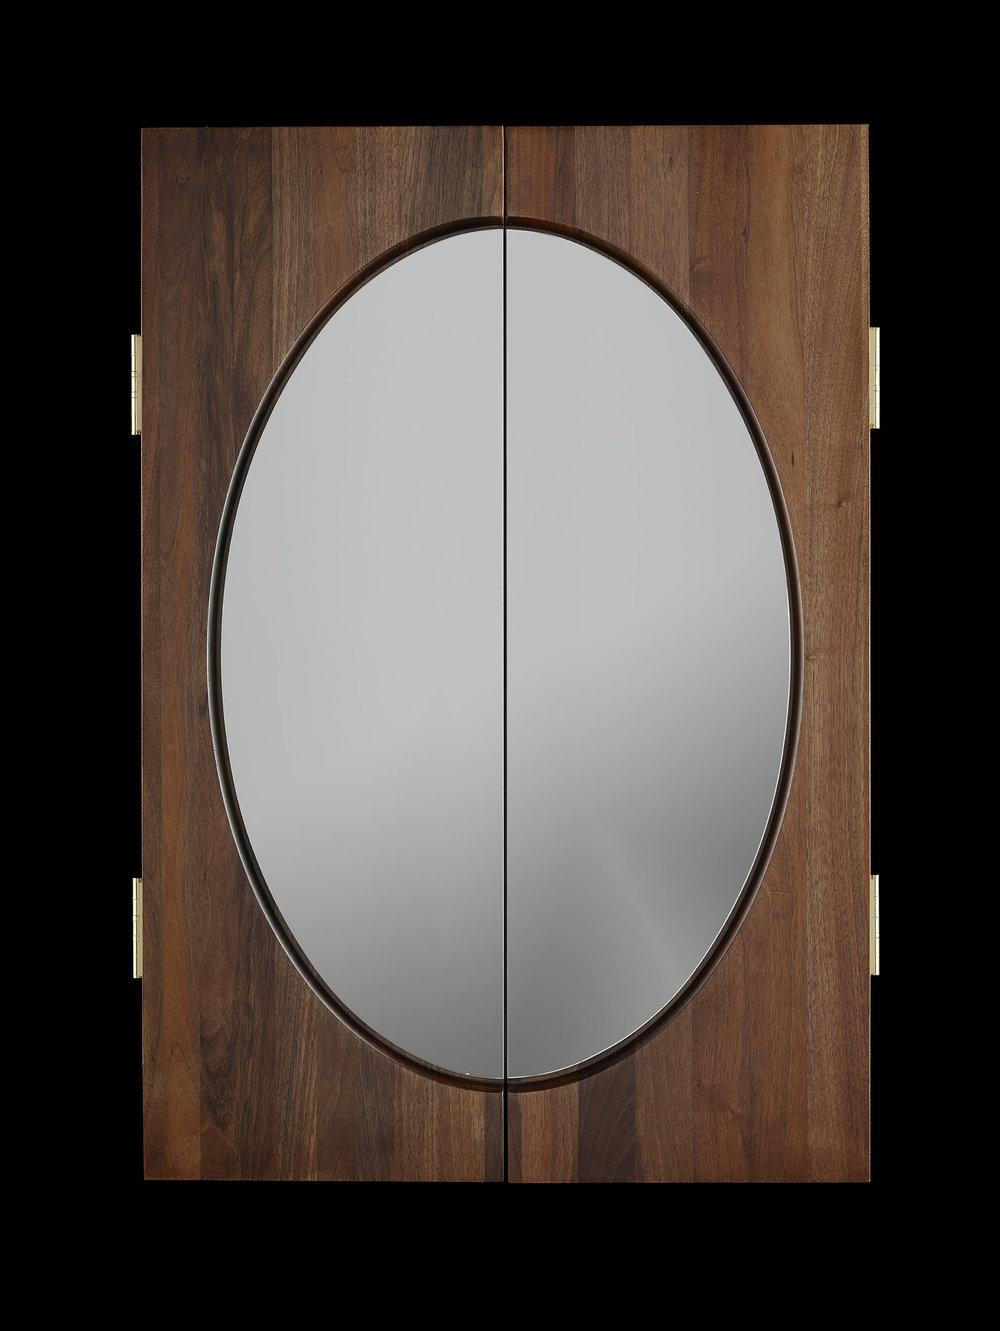 locket frame - Mirrored wall cabinet emulating a locket.